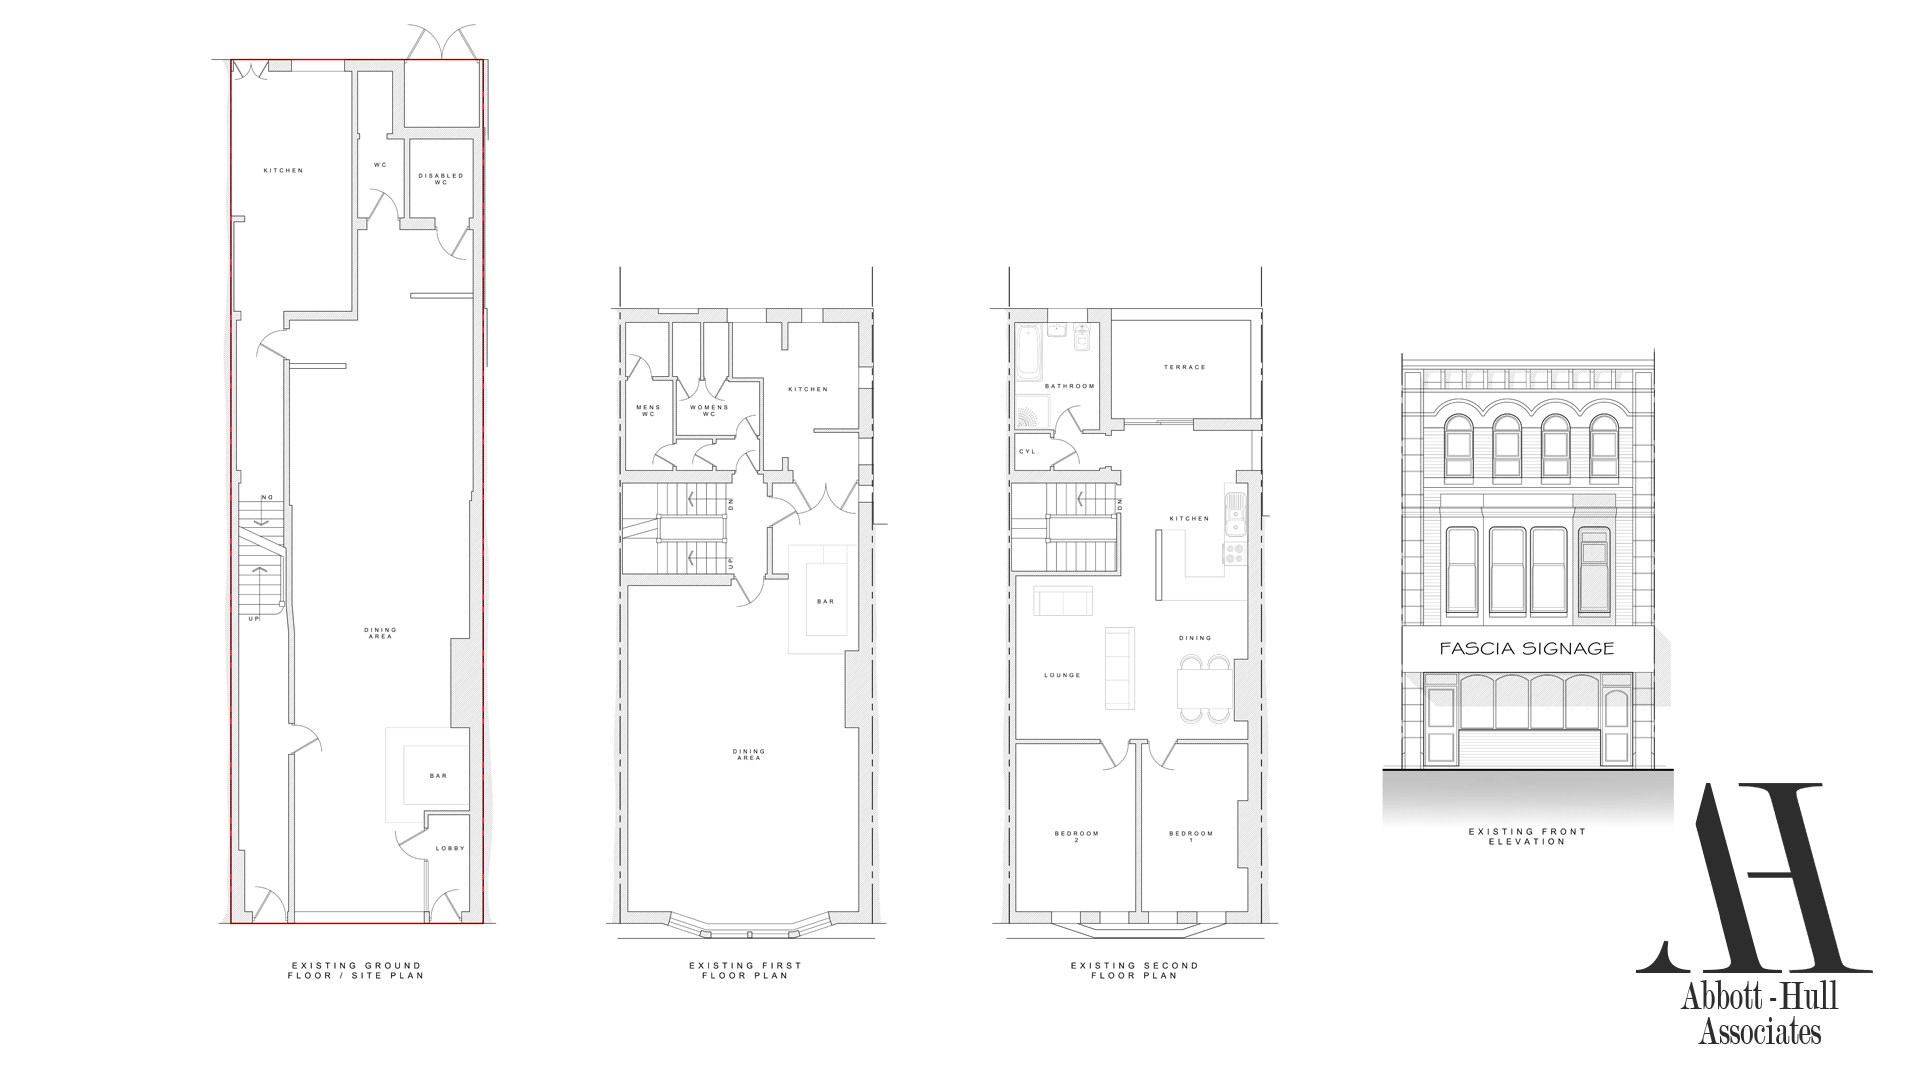 25 North Albert Street, Fleetwood - Existing Plans